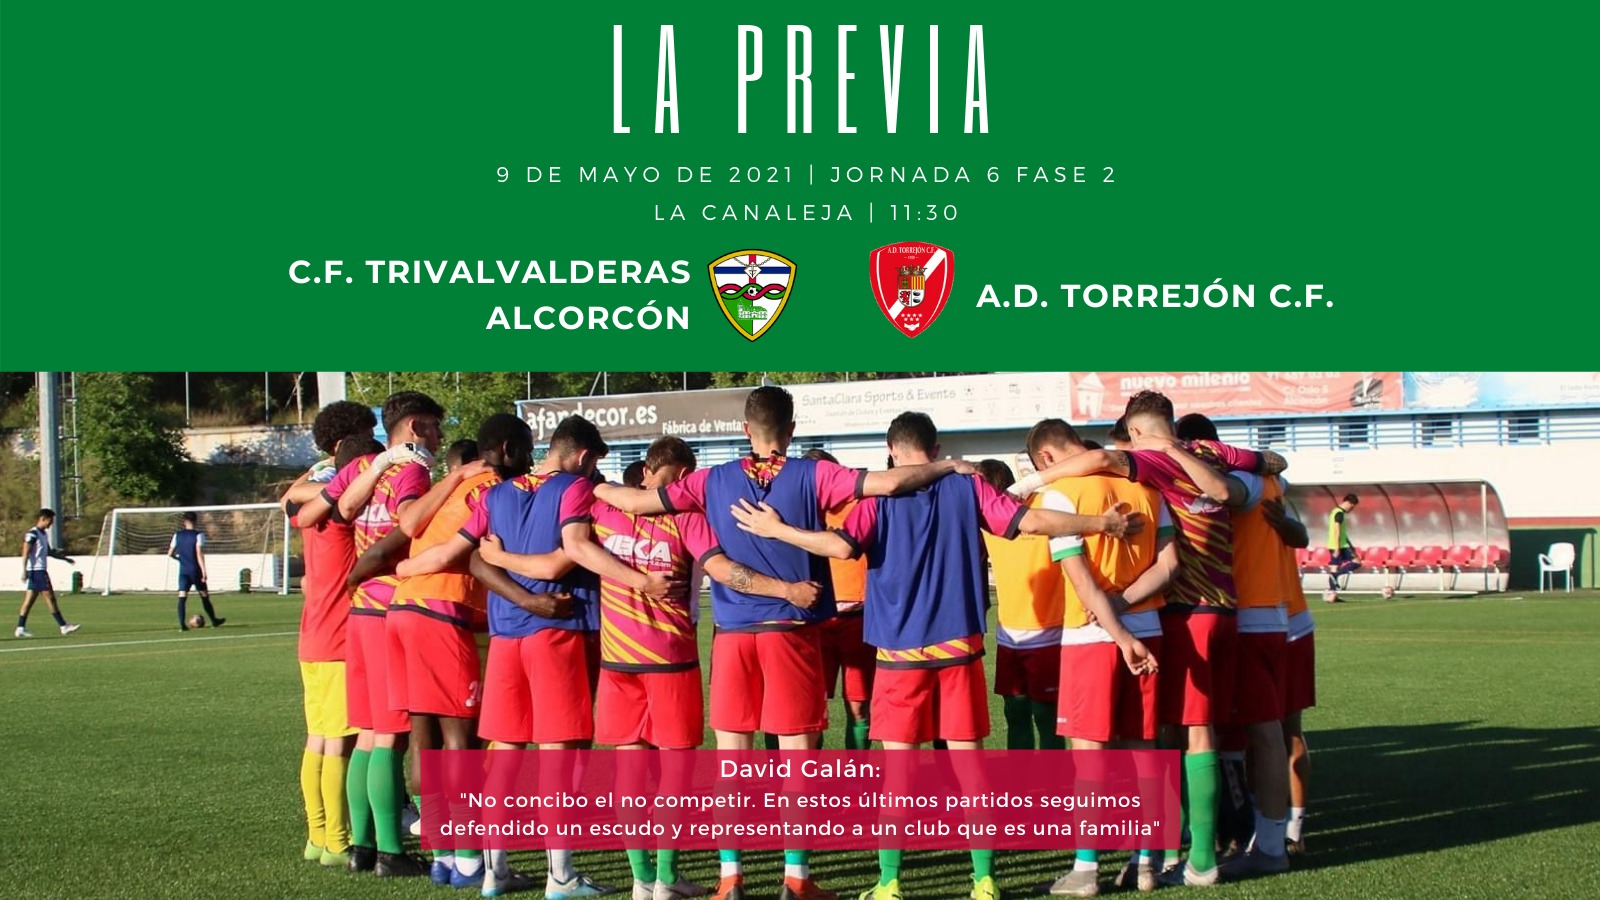 sdsPREVIA J6 FASE 2 | C.F. TrivalValderas Alcorcón - A.D. Torrejón